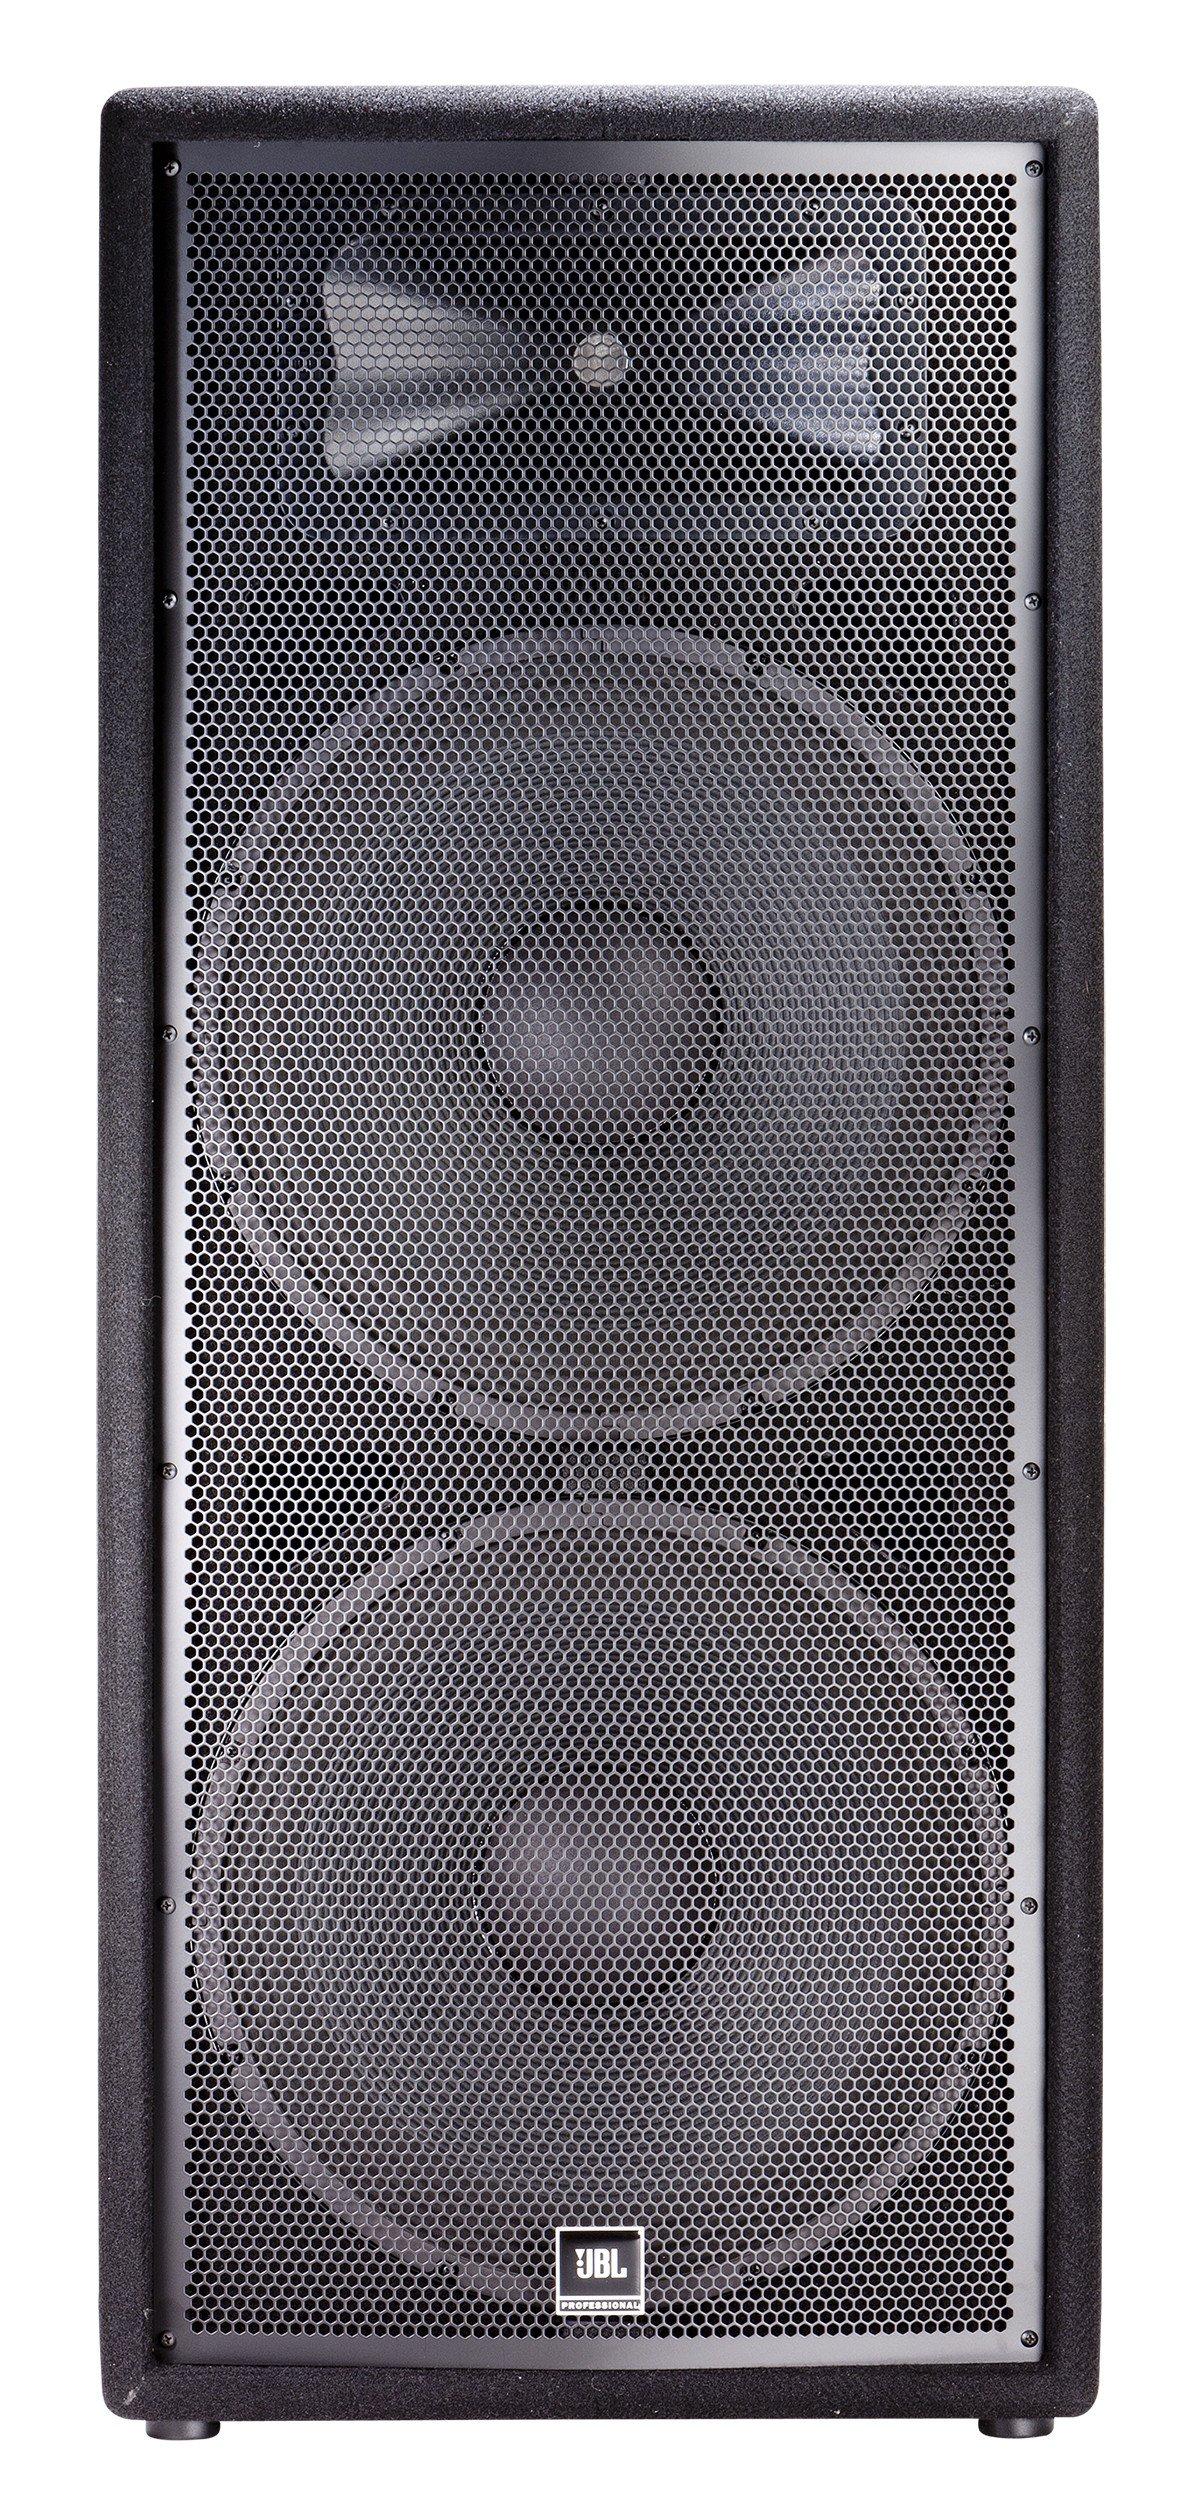 JBL JRX225 Portable Dual 15'' 2-way Sound Reinforcement Loudspeaker System